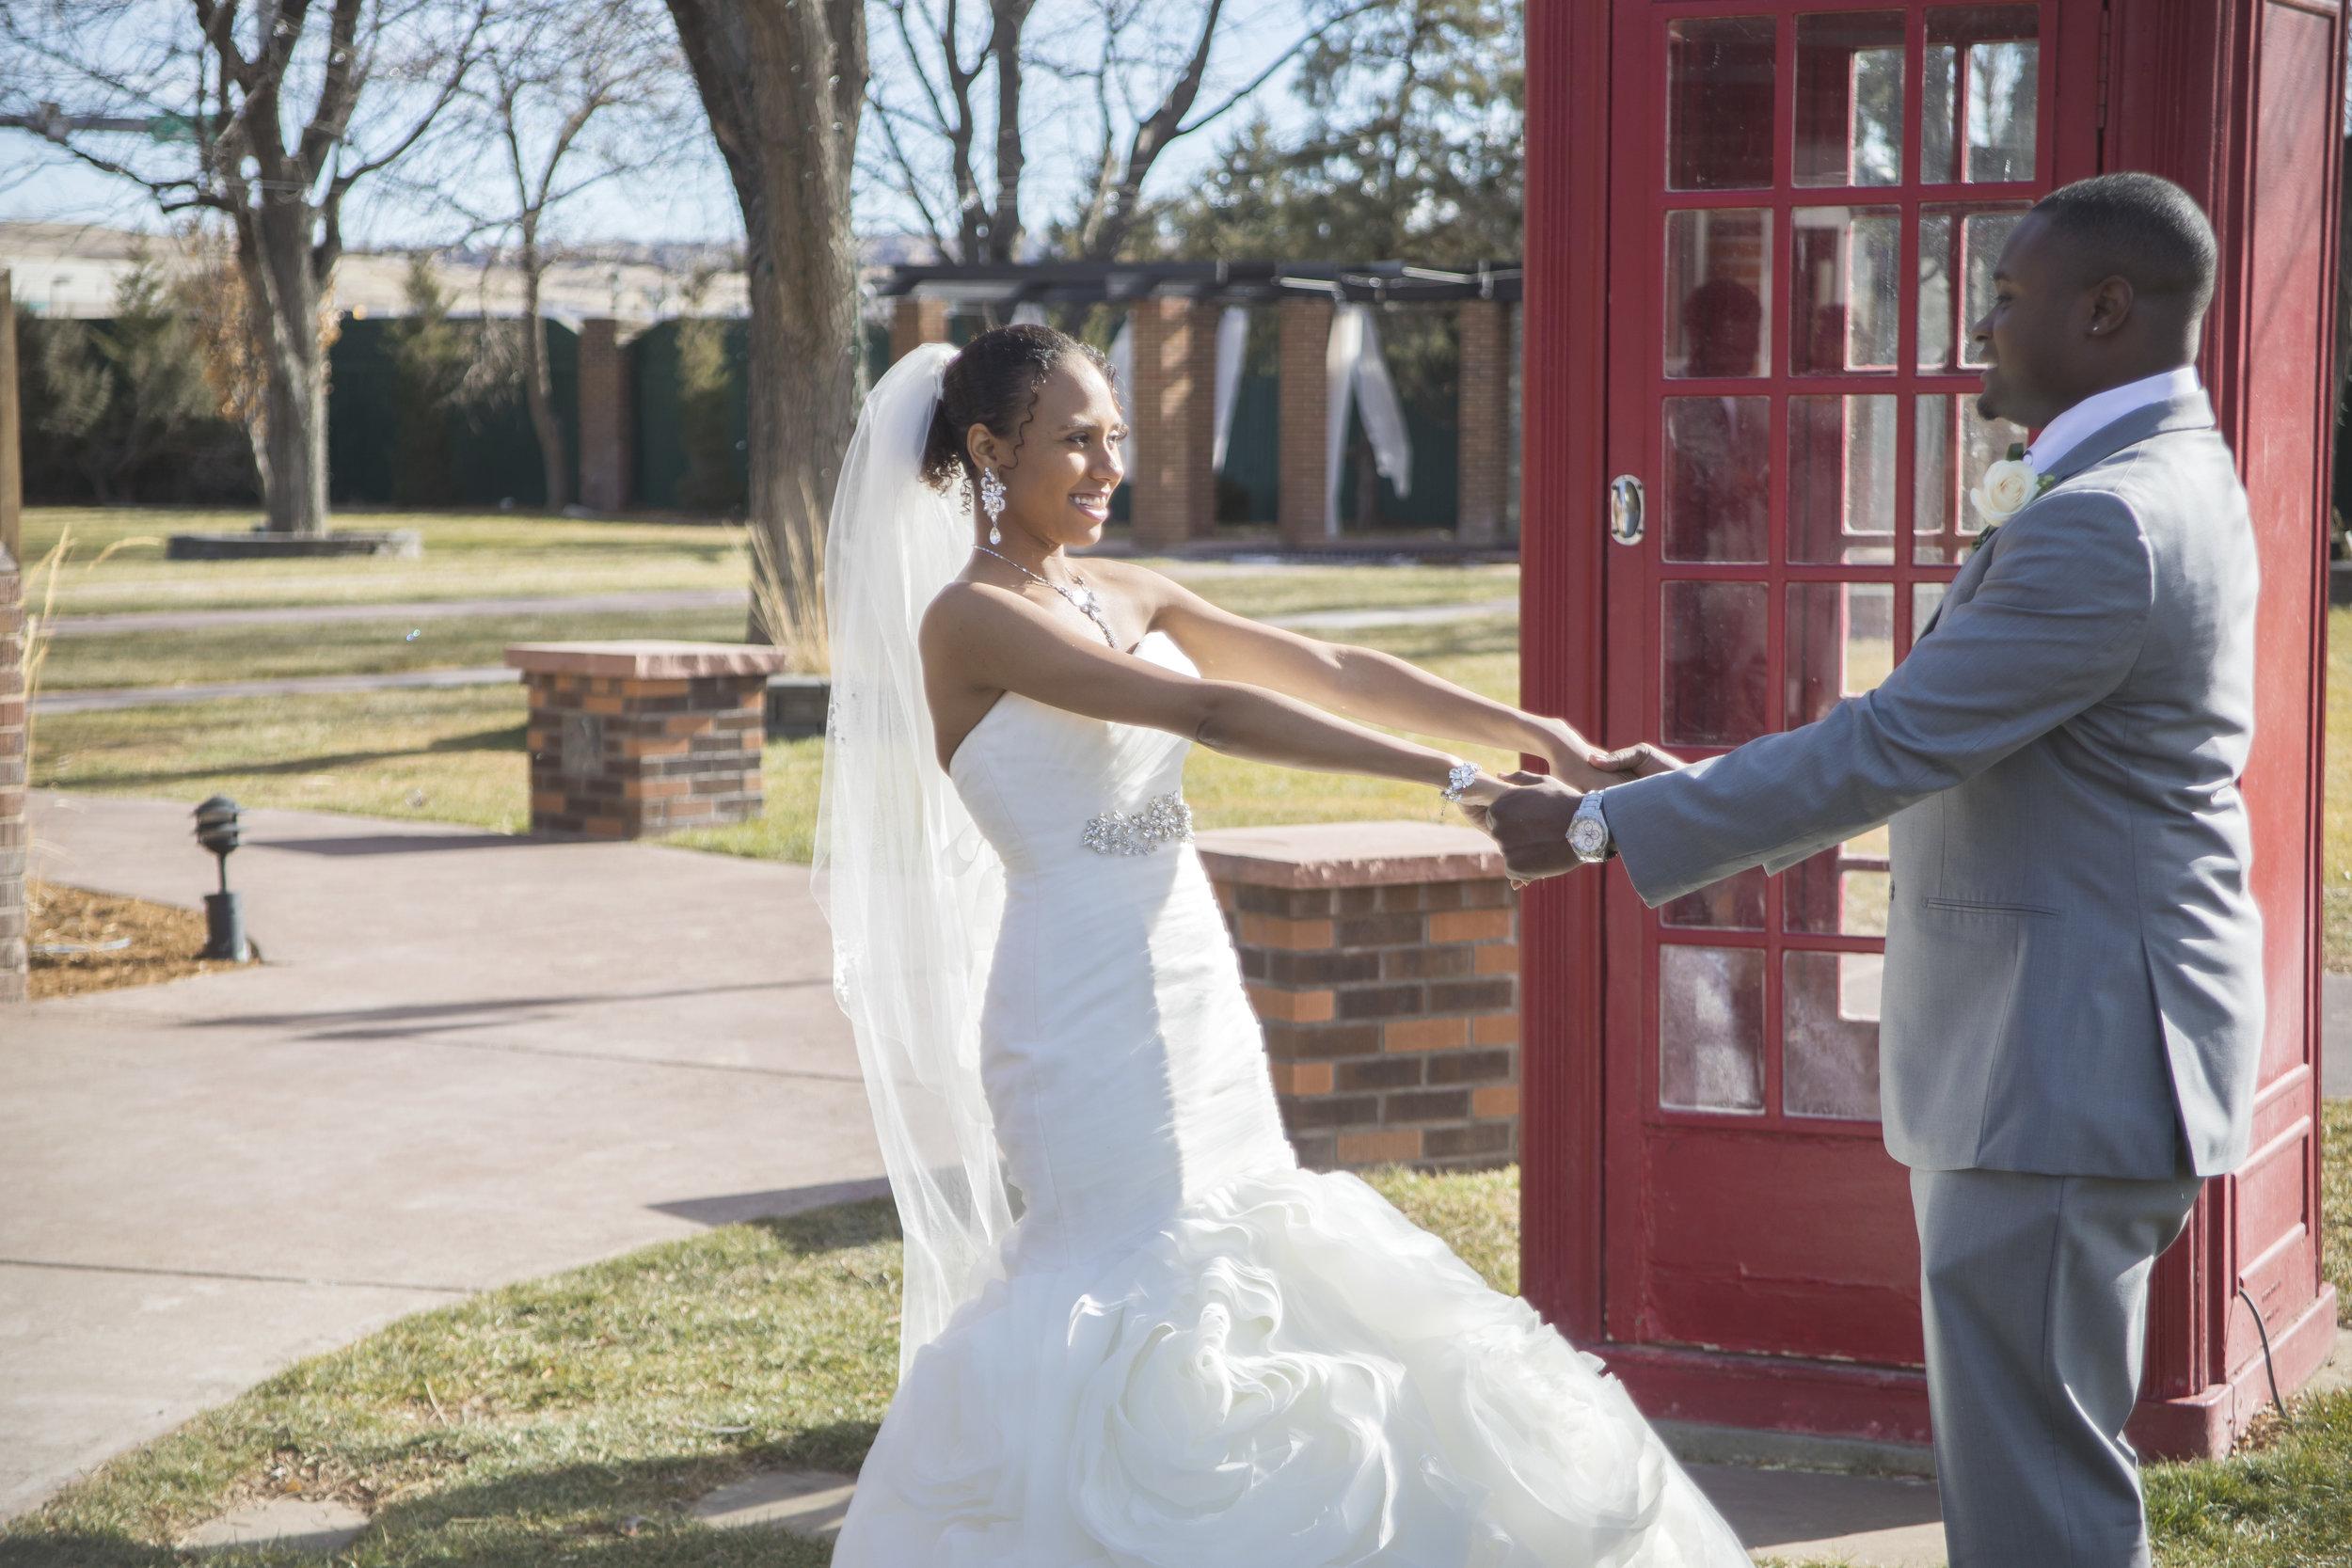 Amanda and Ryan's Winter Wedding in January... 60 degrees!